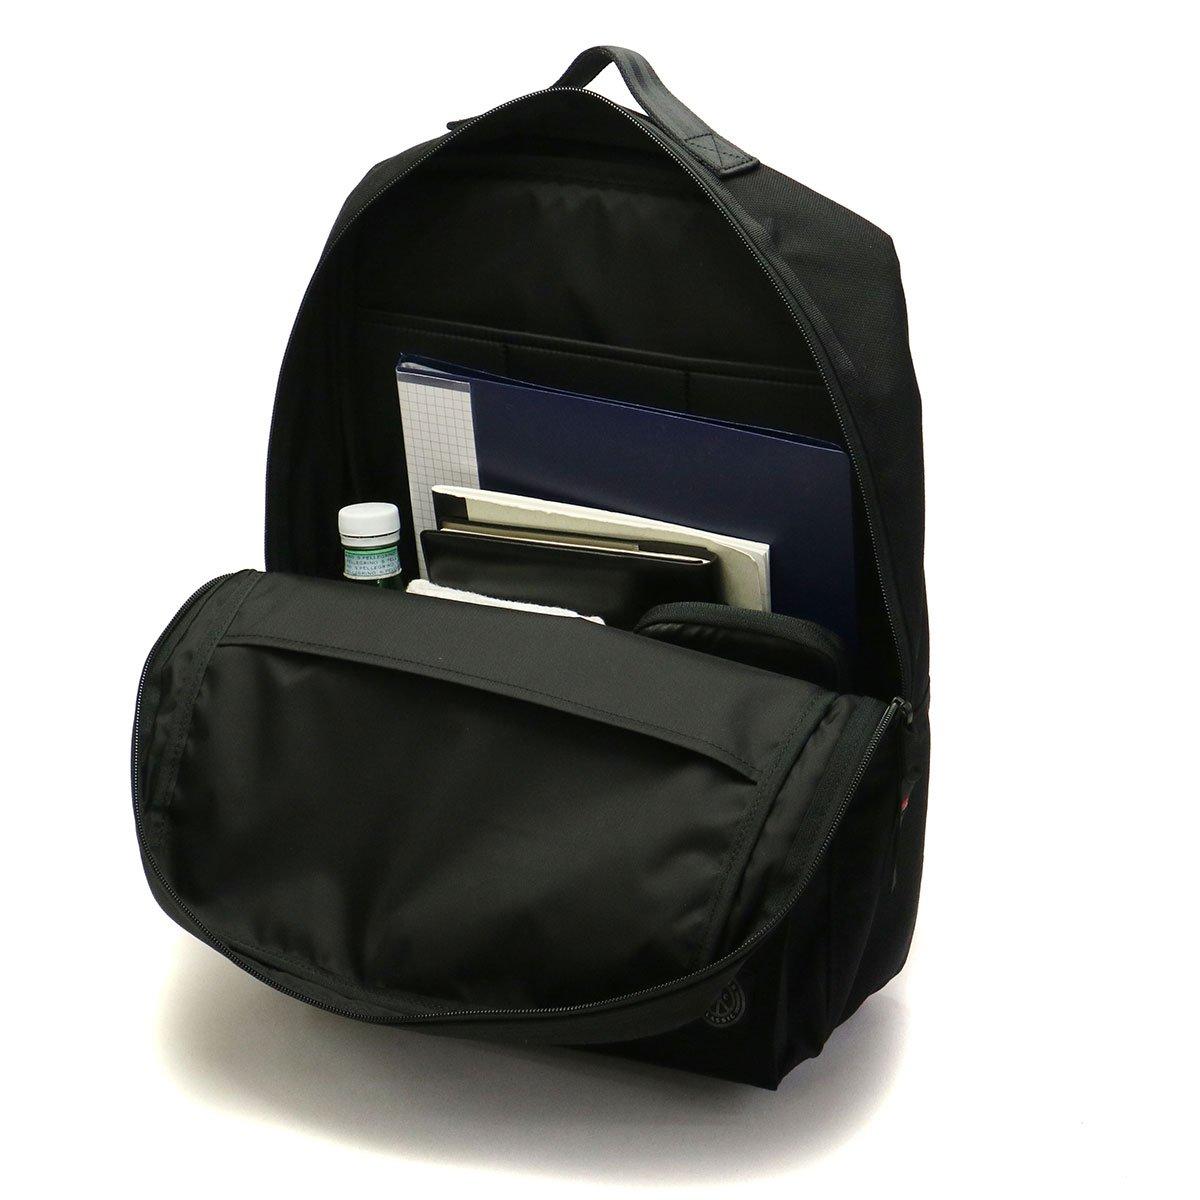 1bc269cc17c2 Amazon | [ポータークラシック]Porter Classic ビジネスリュック Porter Classic muatsu NEWTON  BUSINESS RUCKSACK PC-050-952 ブラック/10 | Porter Classic(ポーター ...